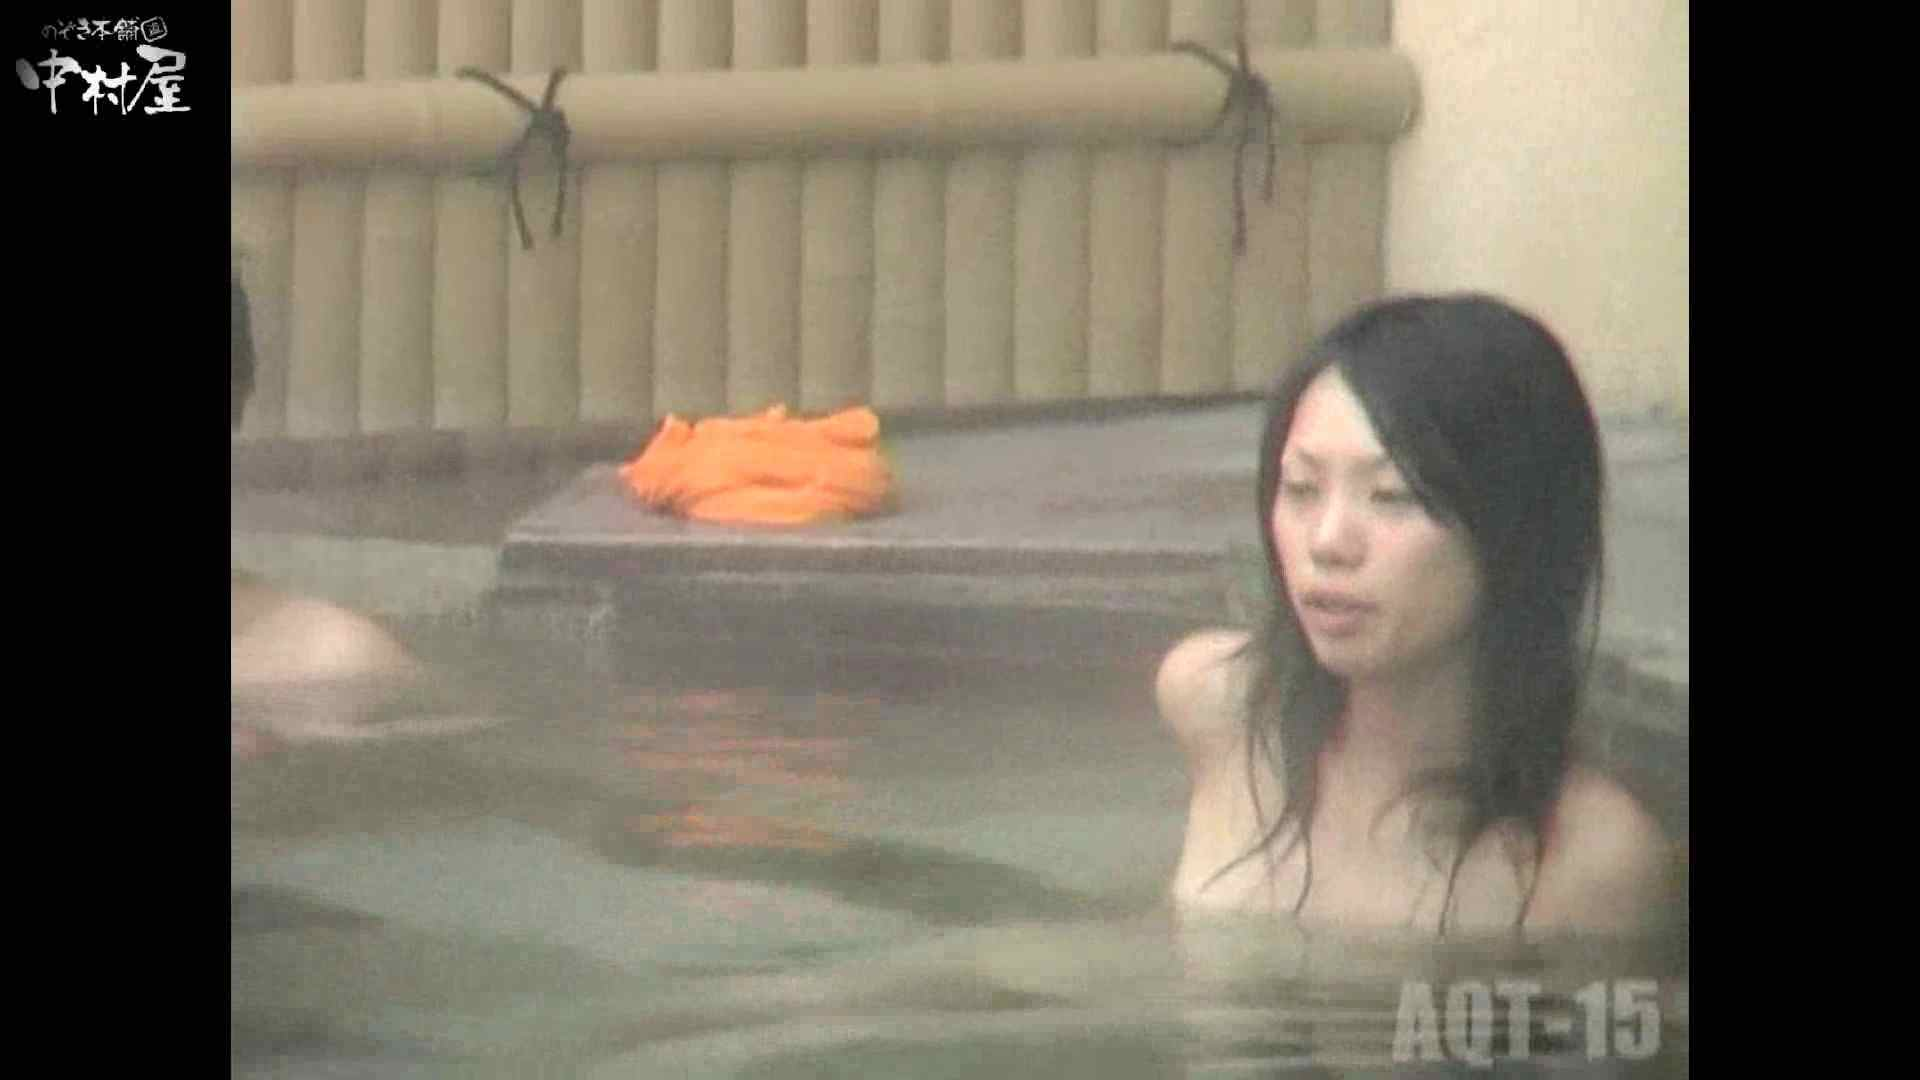 Aquaな露天風呂Vol.878潜入盗撮露天風呂十五判湯 其の八 美しいOLの裸体   潜入突撃  95pic 61